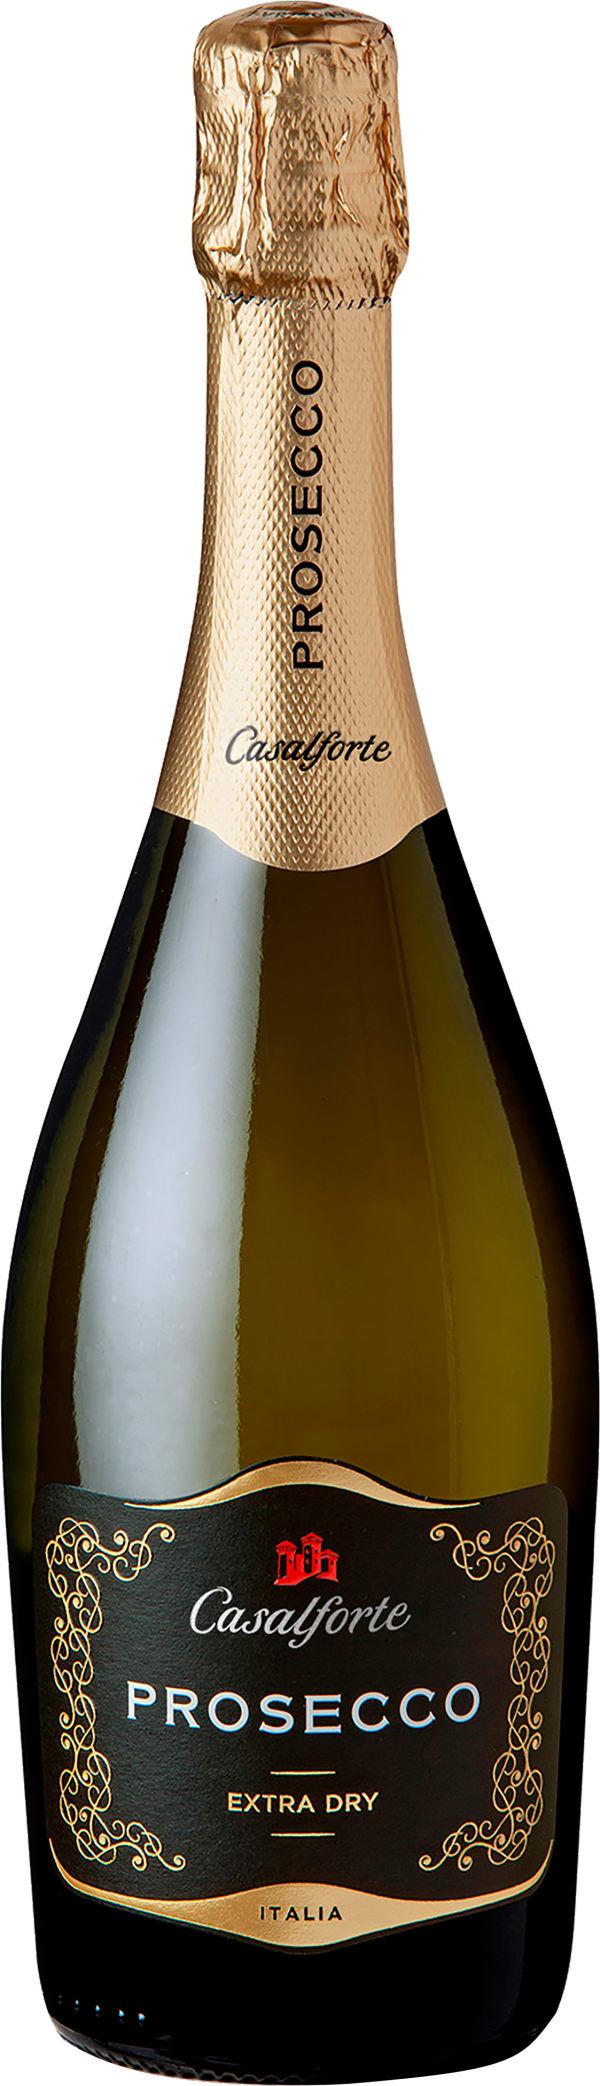 Castelforte Prosecco Extra Dry